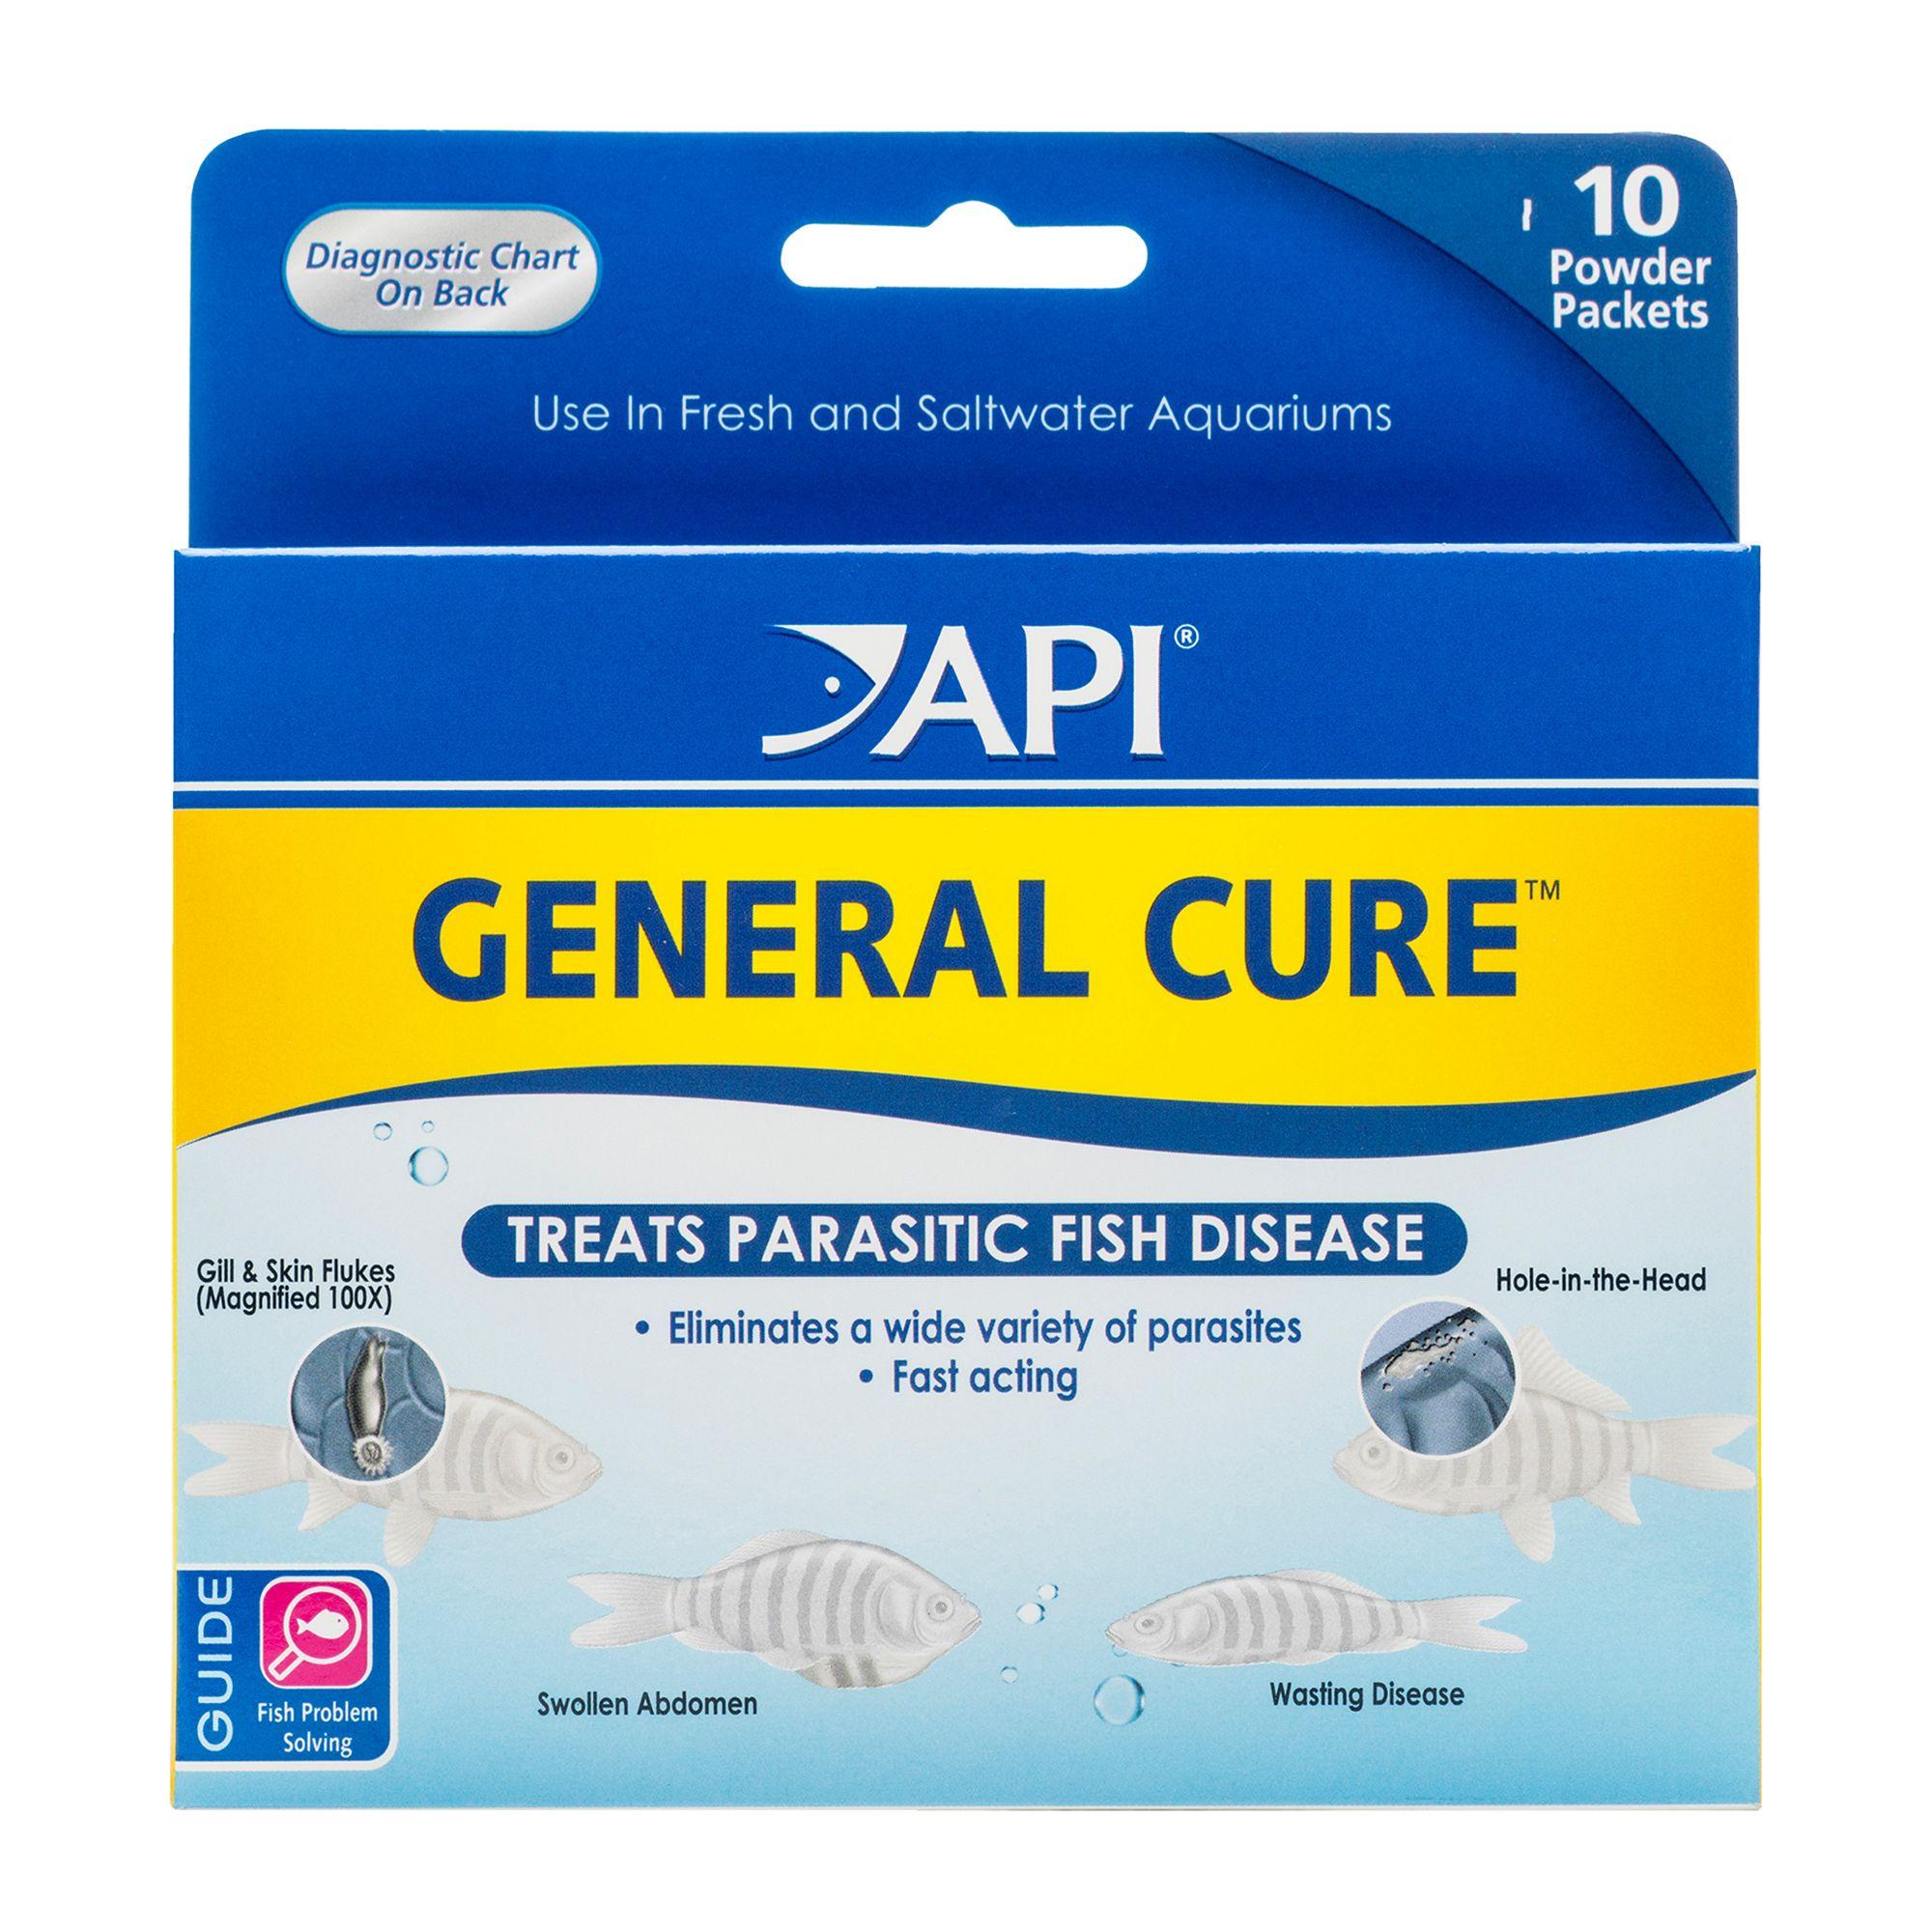 Api Guide Fish Problem Solving General Cure Size 1.4 Fl Oz